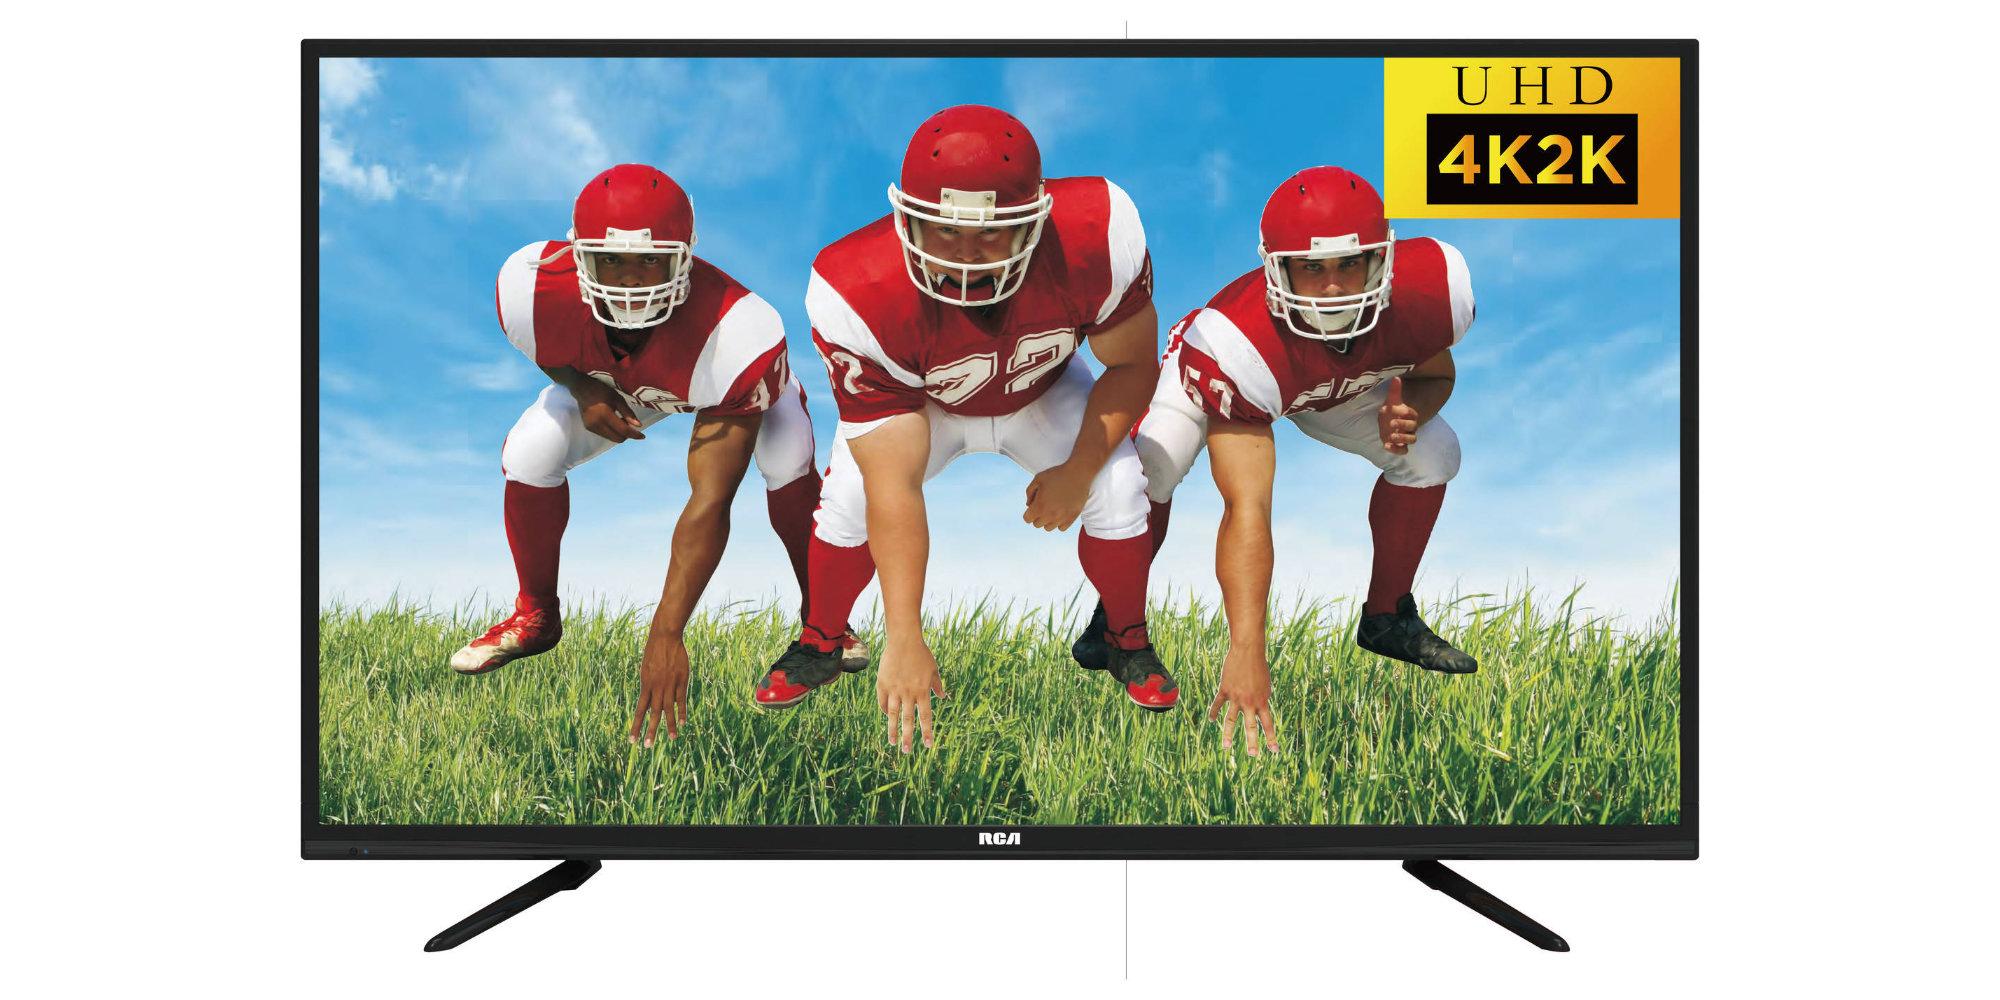 Make the switch to 4K w/ RCA's 50-inch UHDTV, now $240 (Reg. $300+)